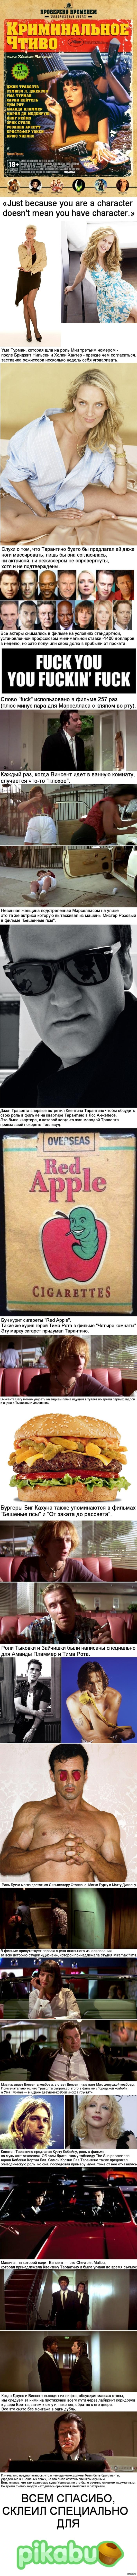 http://s.pikabu.ru/post_img/2013/03/16/8/1363438331_1581254159.jpg